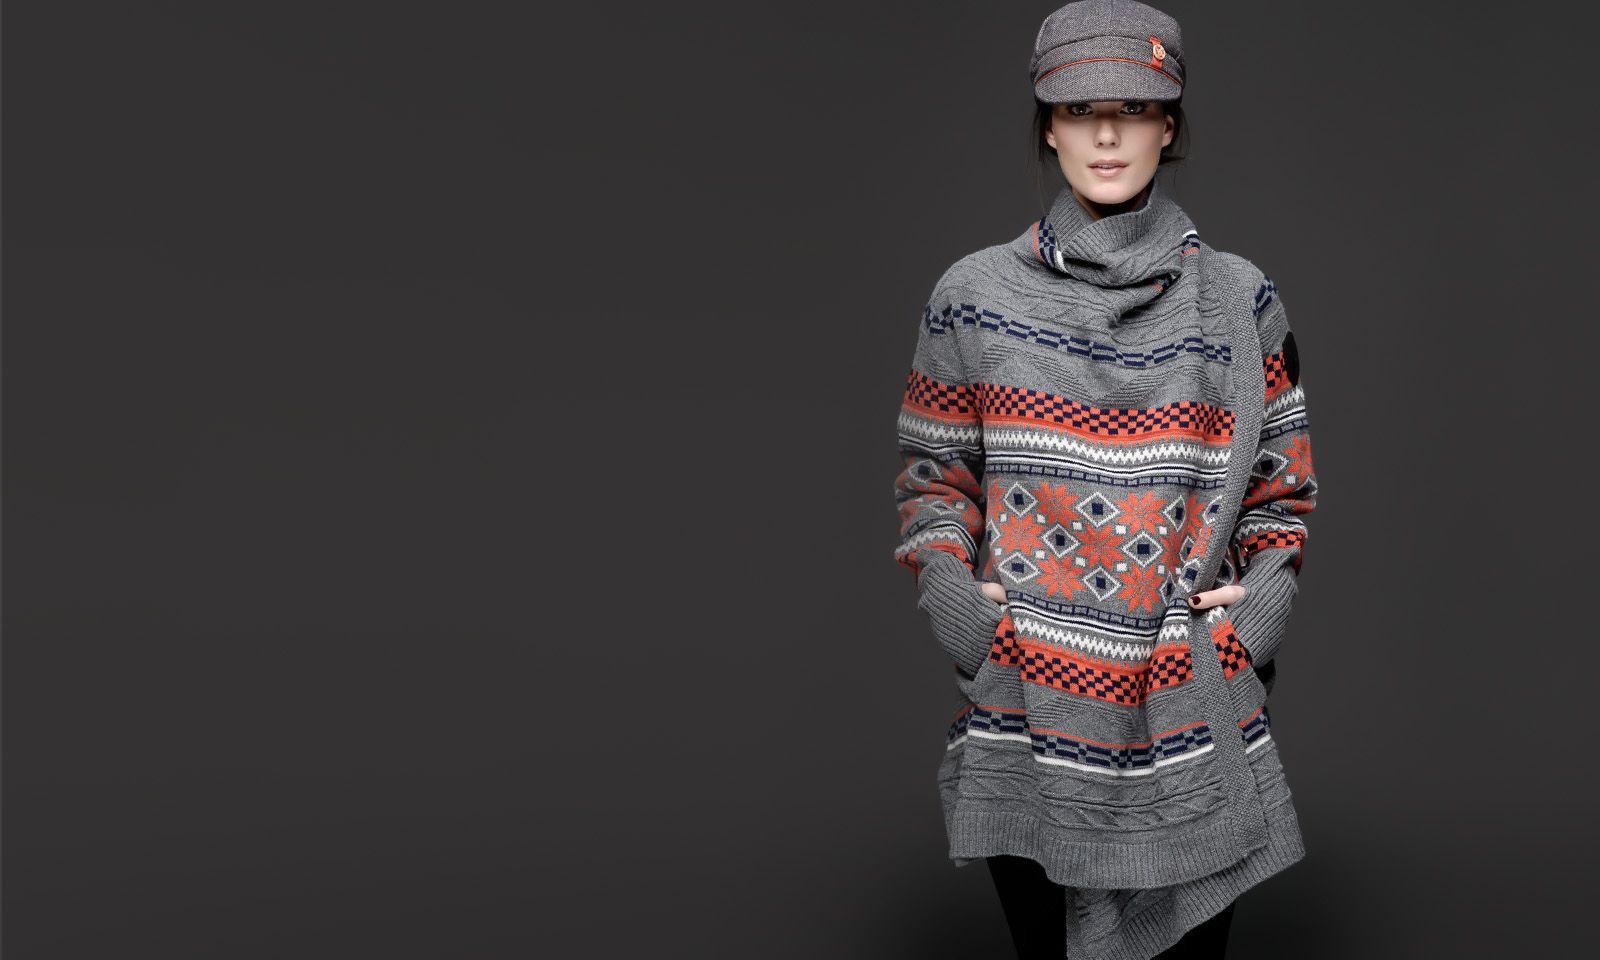 hat + sweater=loooooove